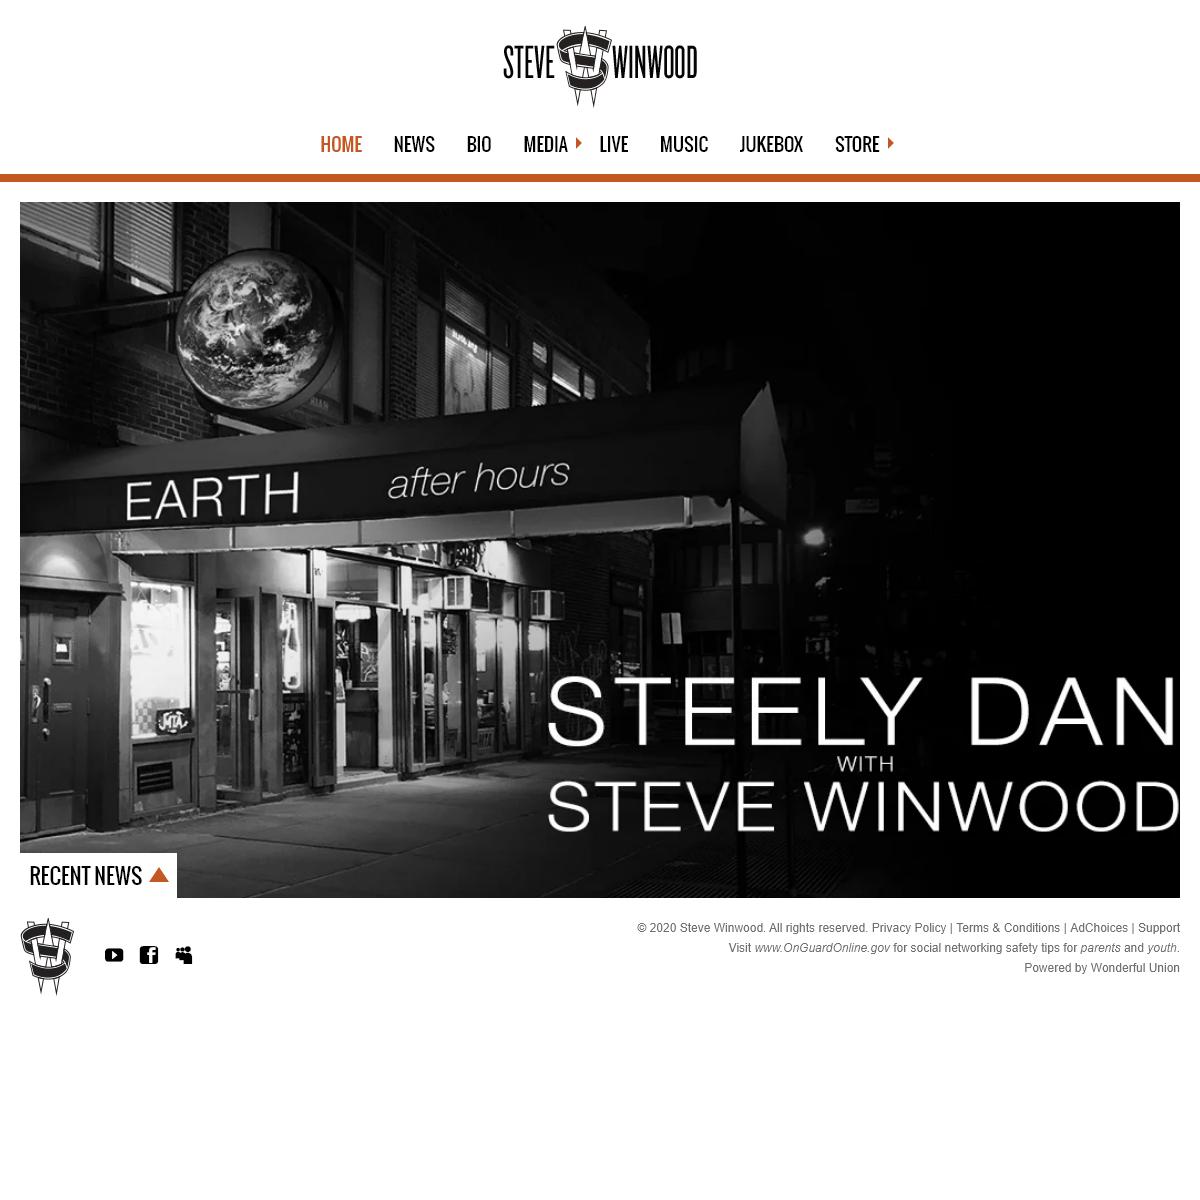 Steve Winwood - Official Site